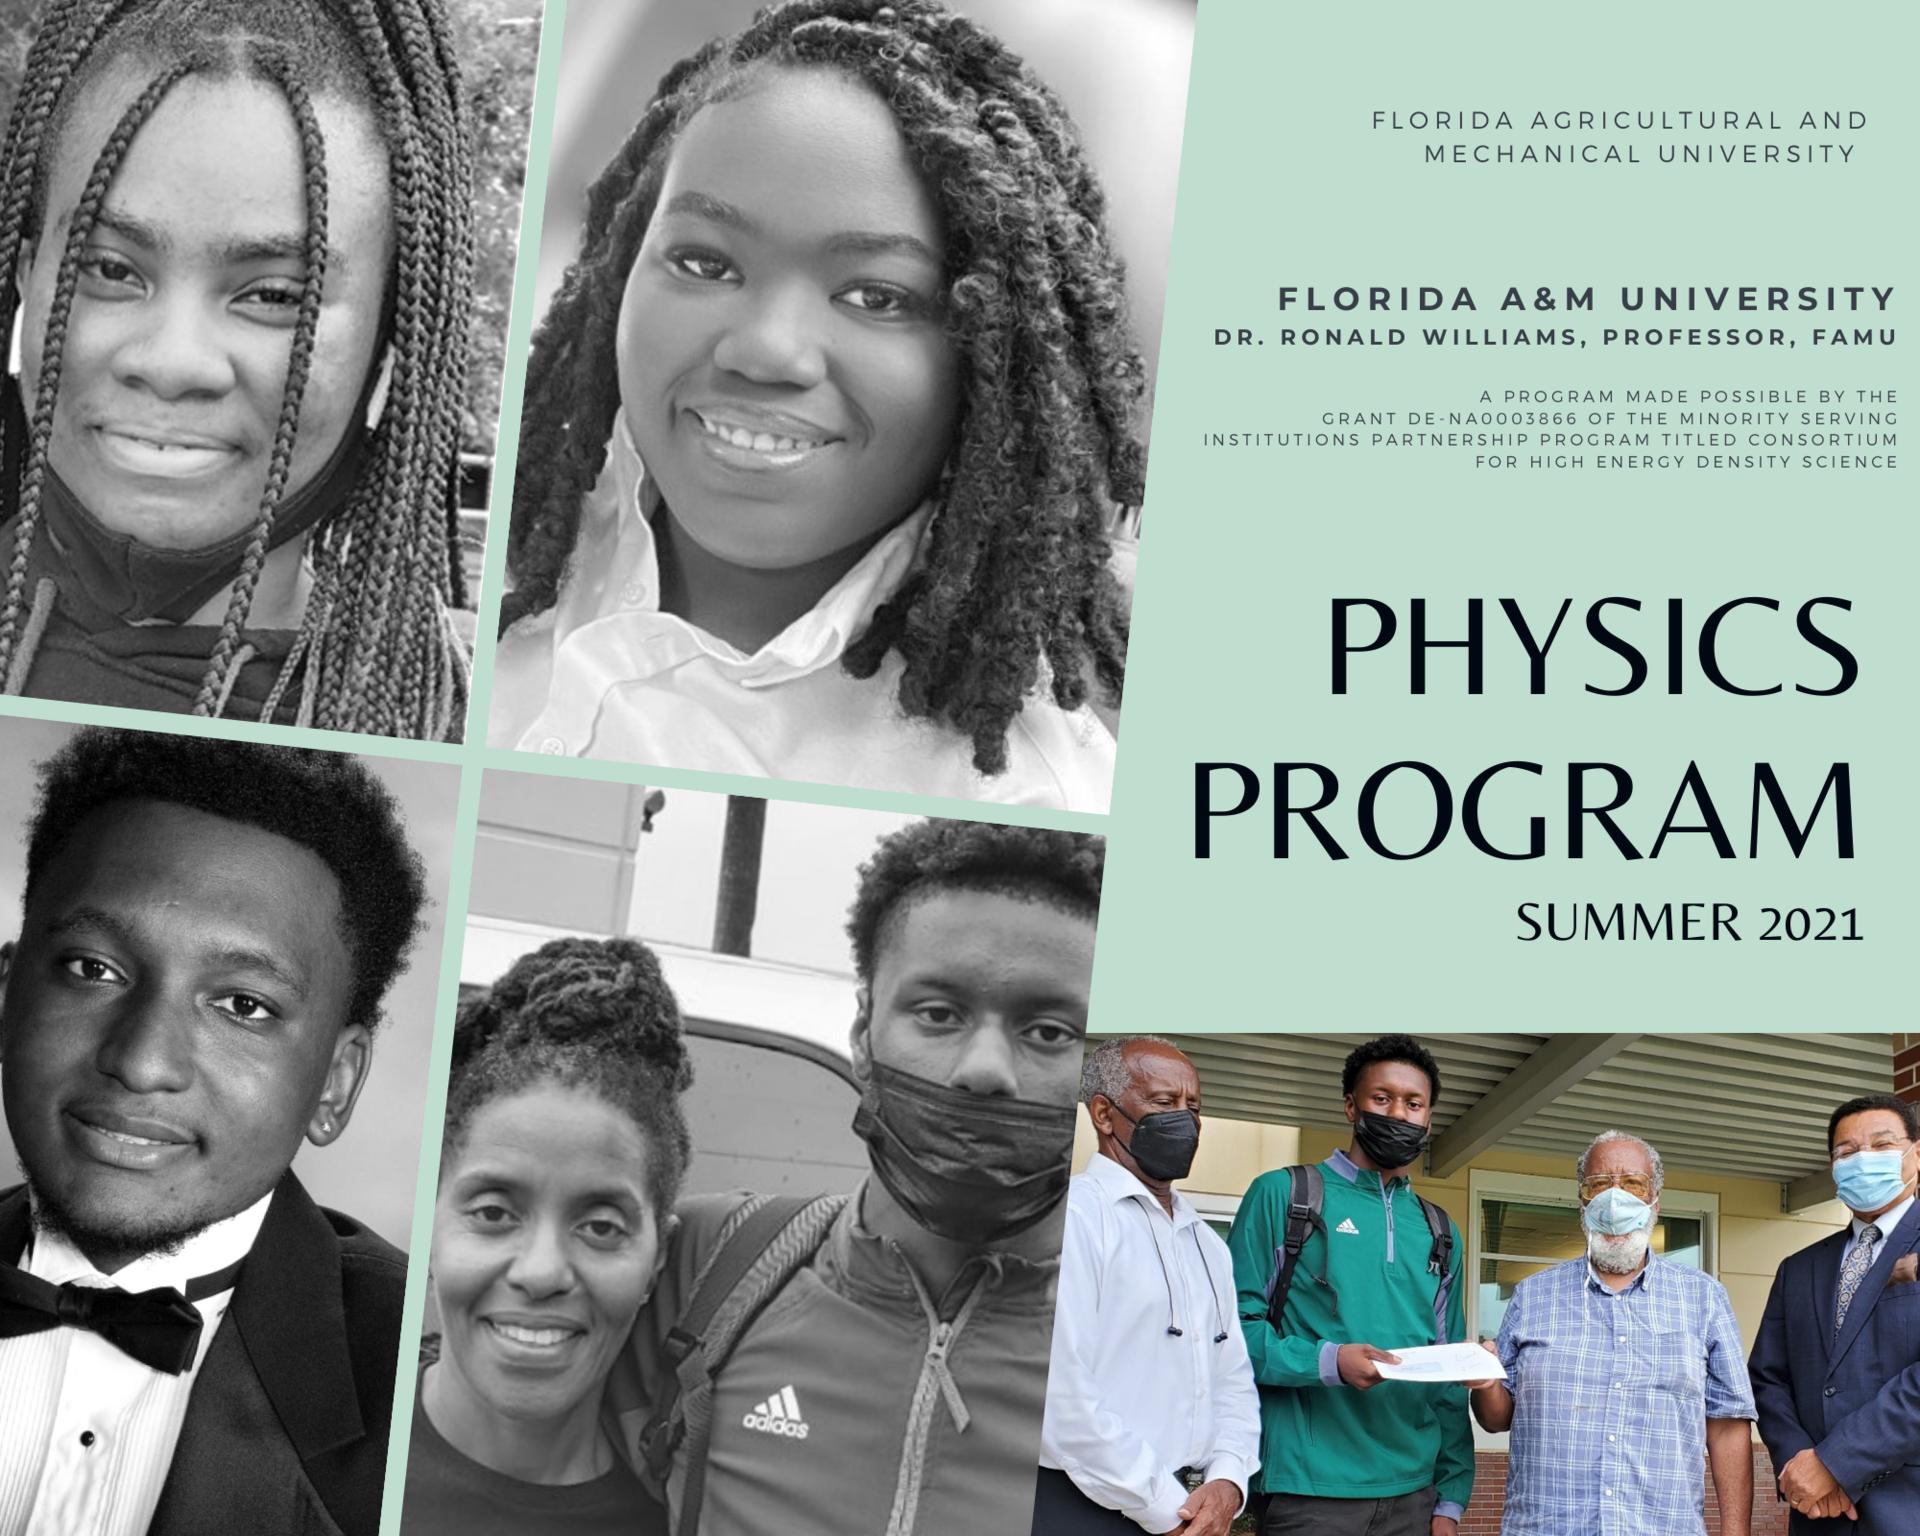 FAMU Summer 2021 Physics Program